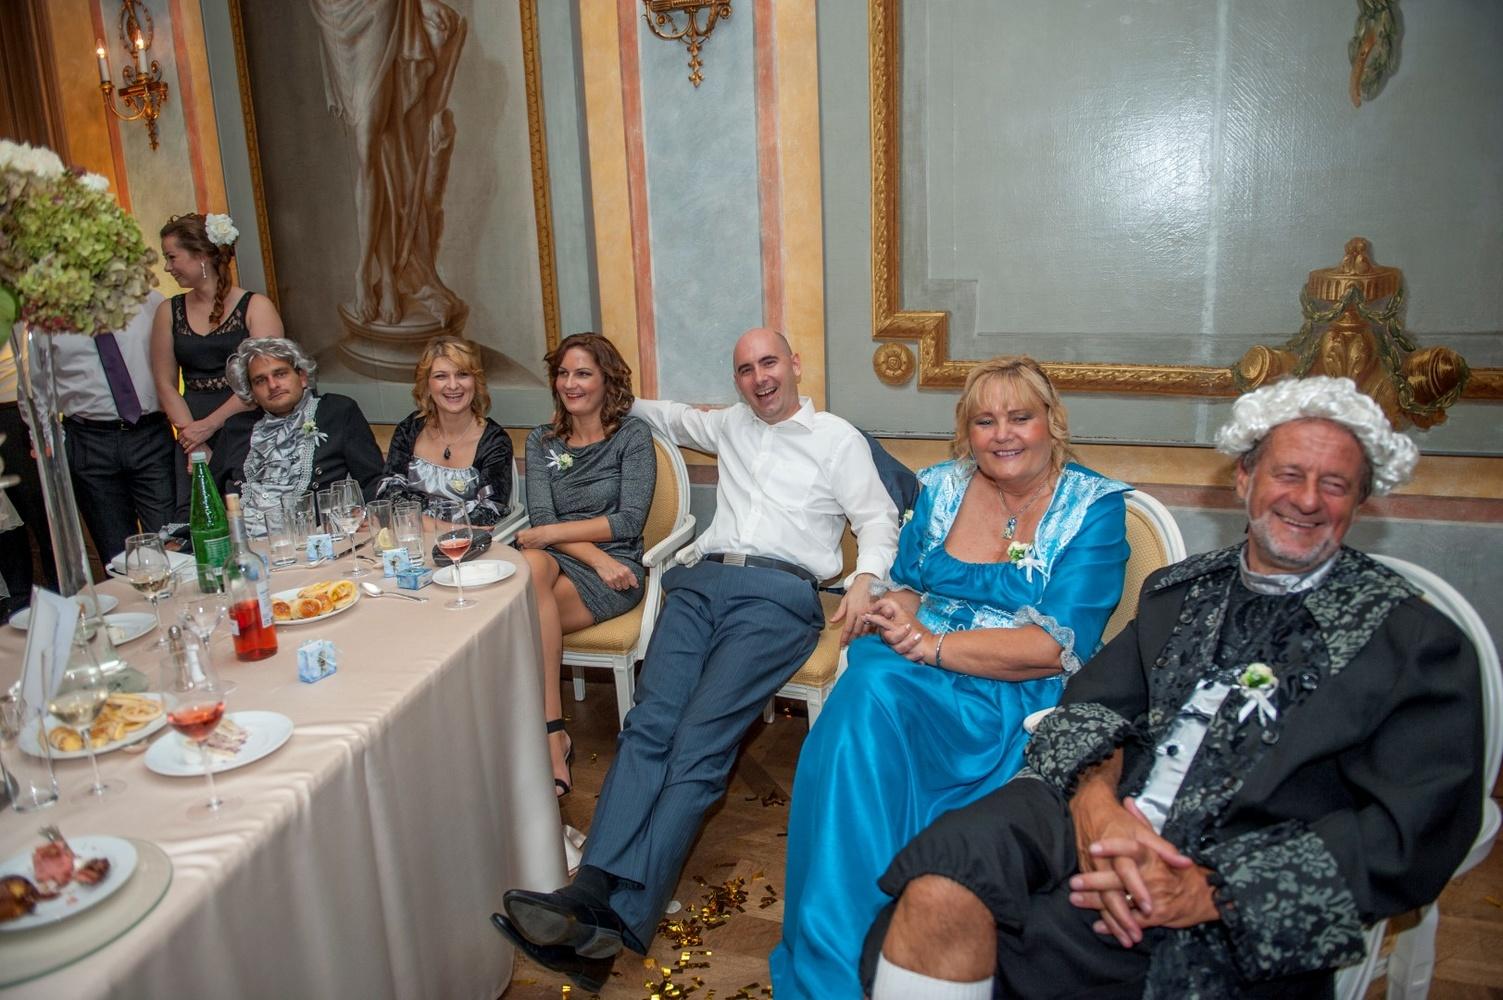 http://www.fotoz.sk/images/gallery-12/normal/svadba_hotel-chateau-bela_202.jpg